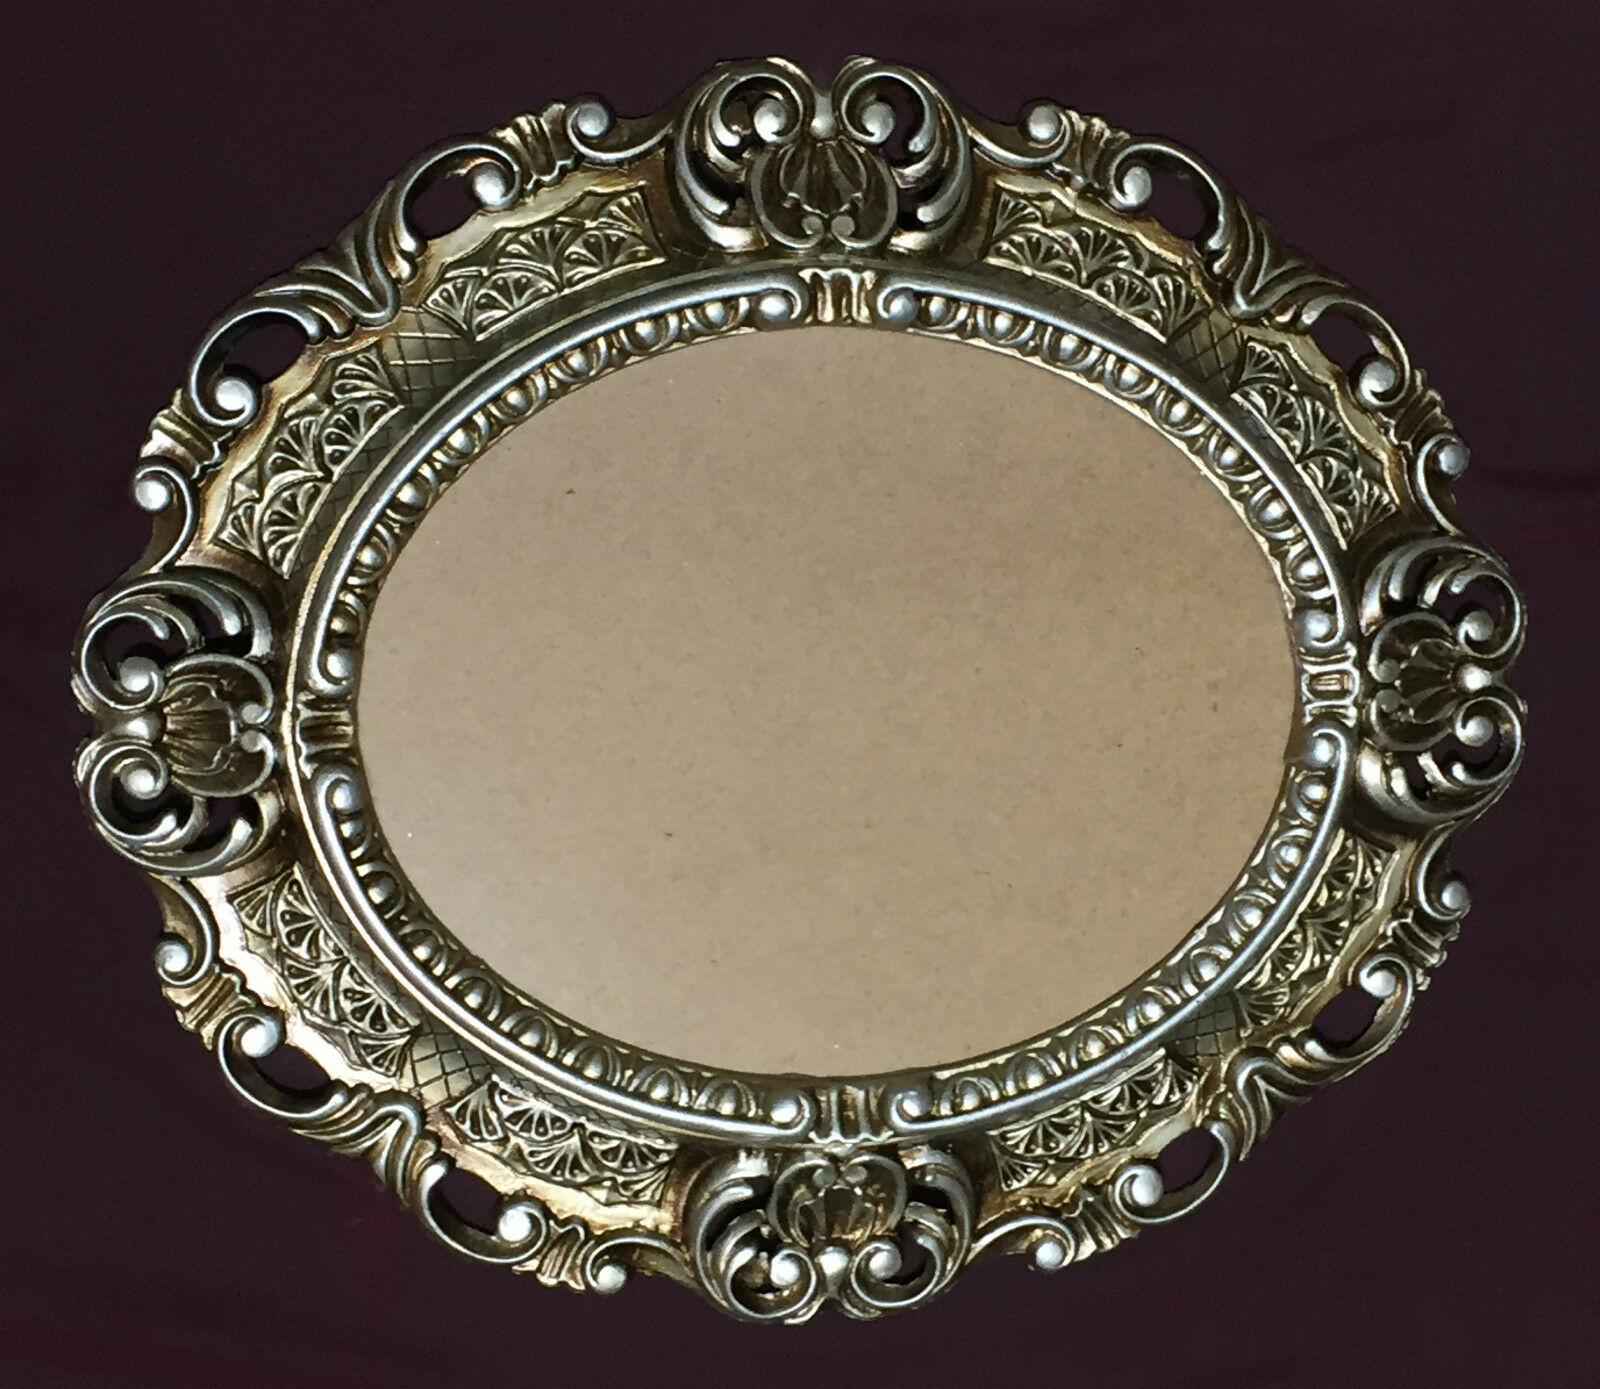 Bilderrahmen Barock Silber Oval 45X37 Fotorahmen Antik Bilderrahmen mit Glas